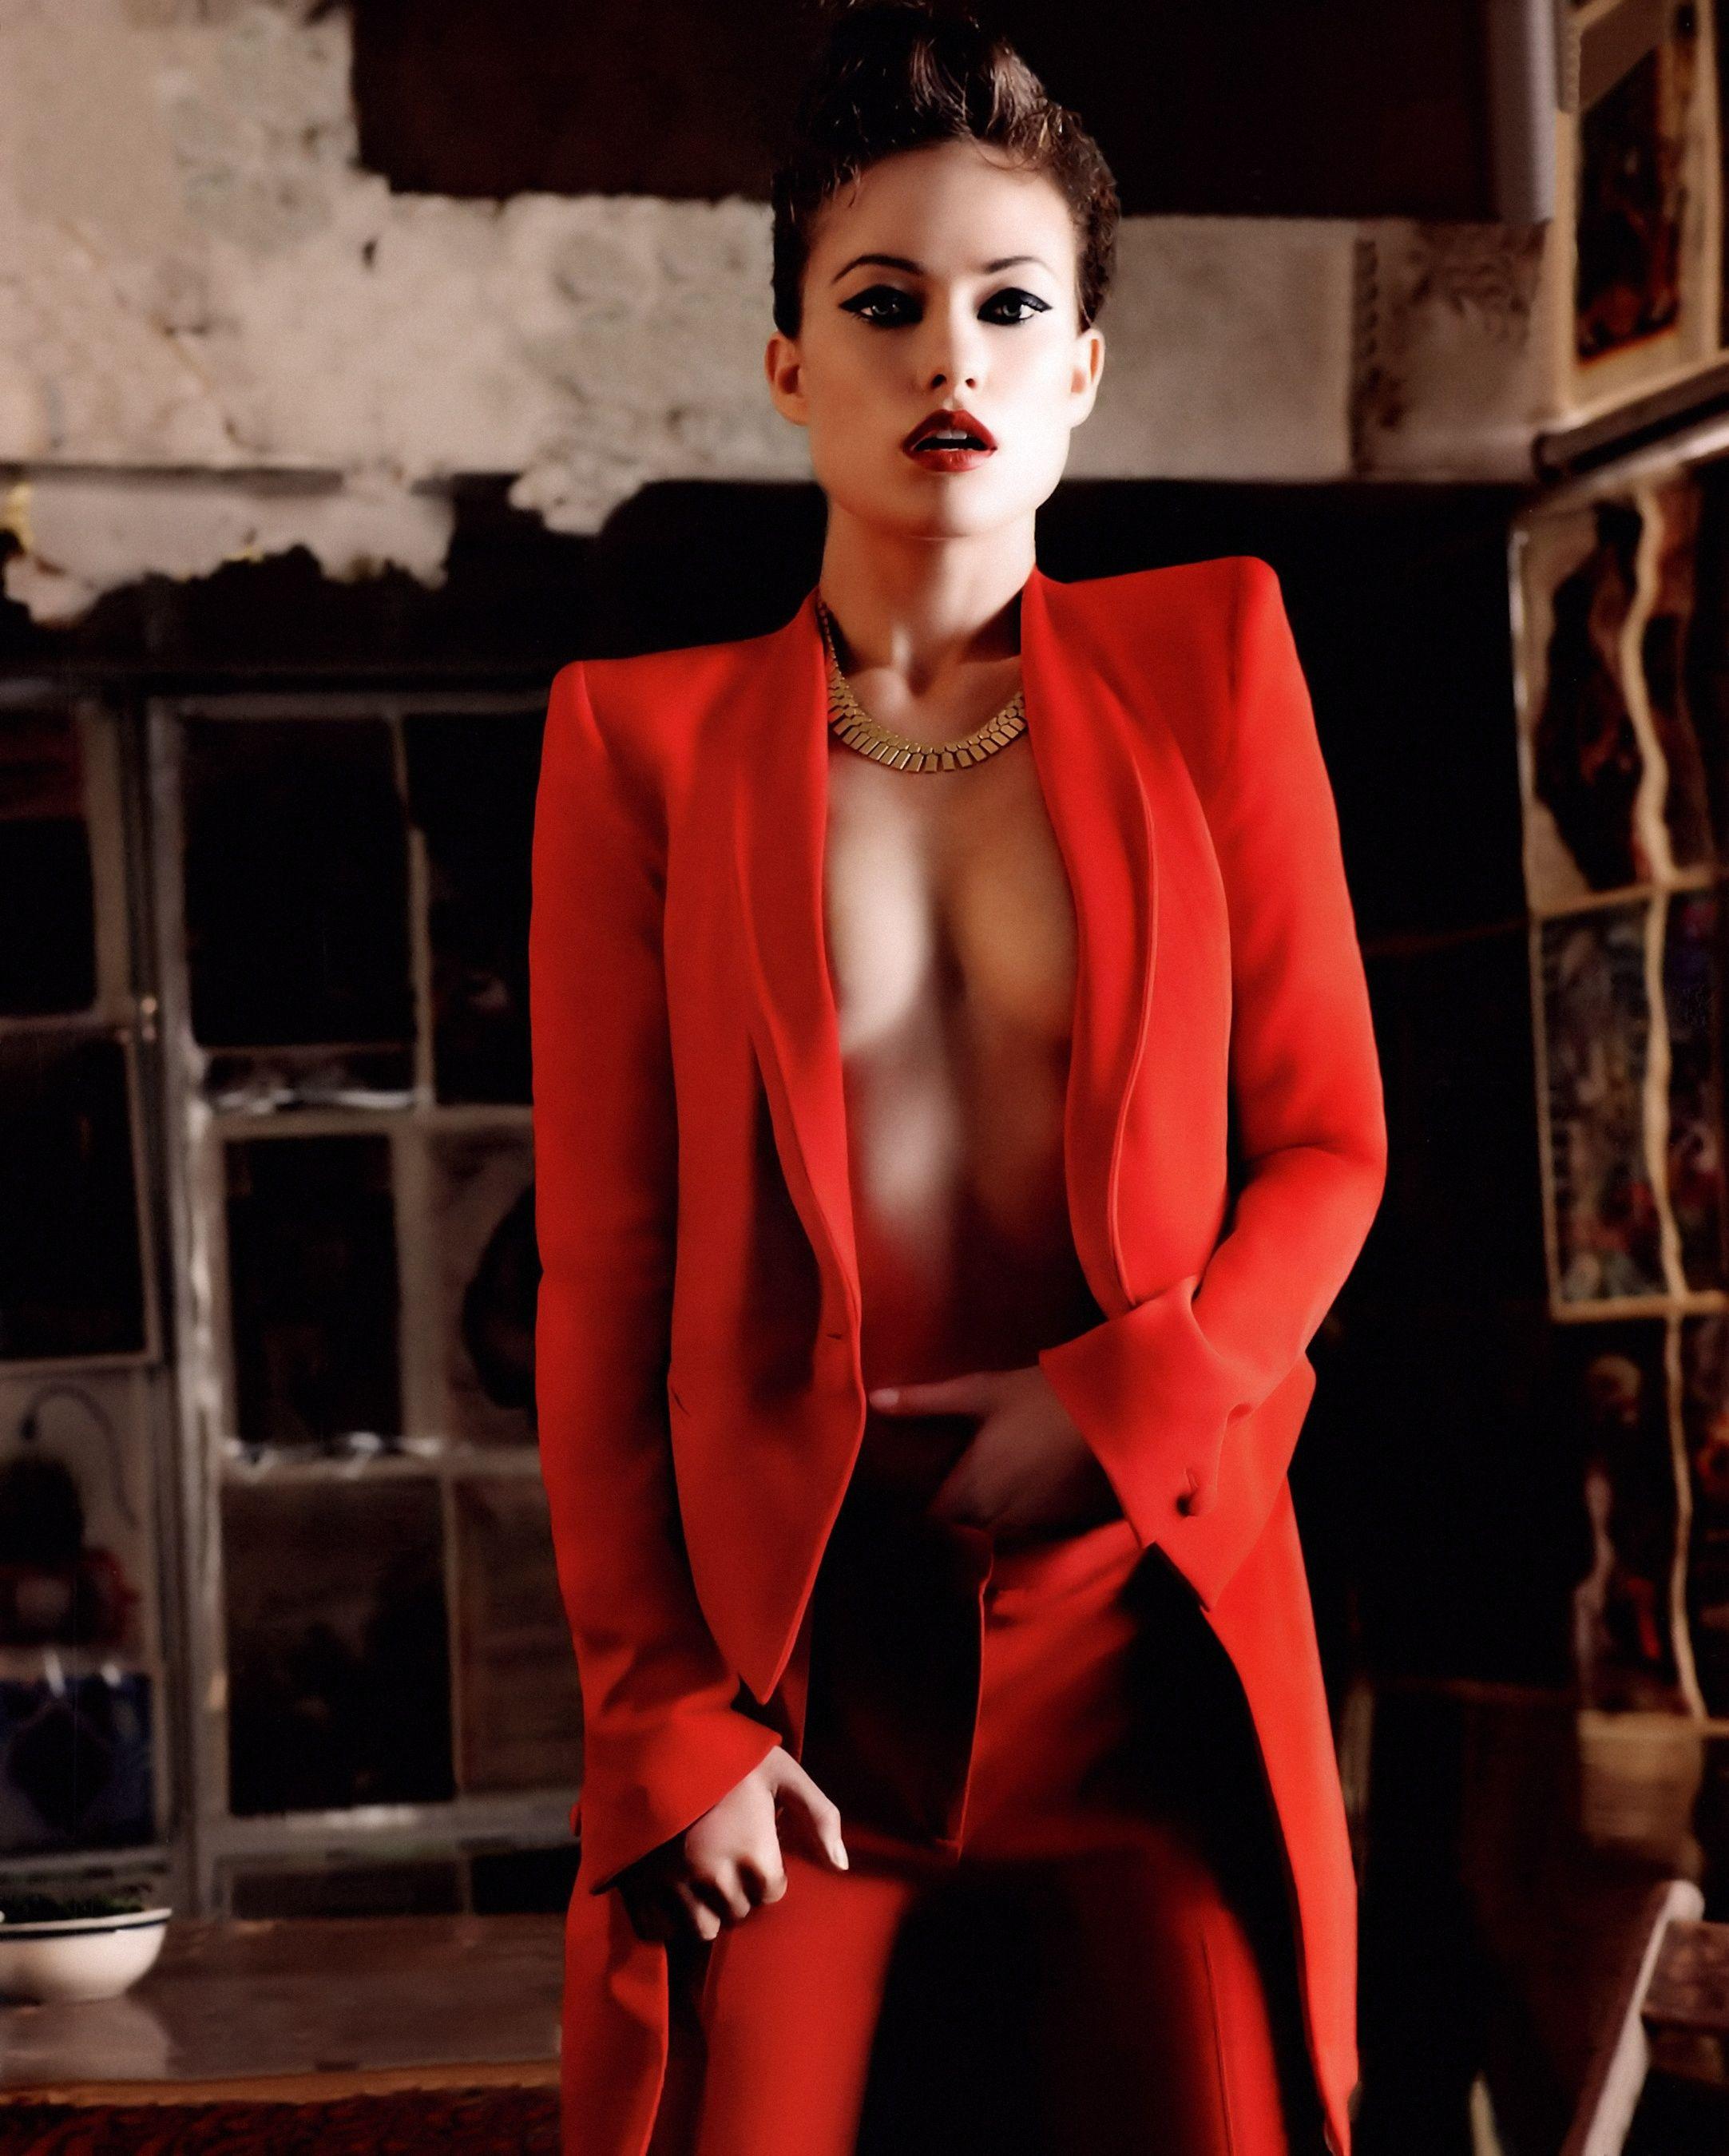 Olivia Wilde – Wild Photoshoot :)